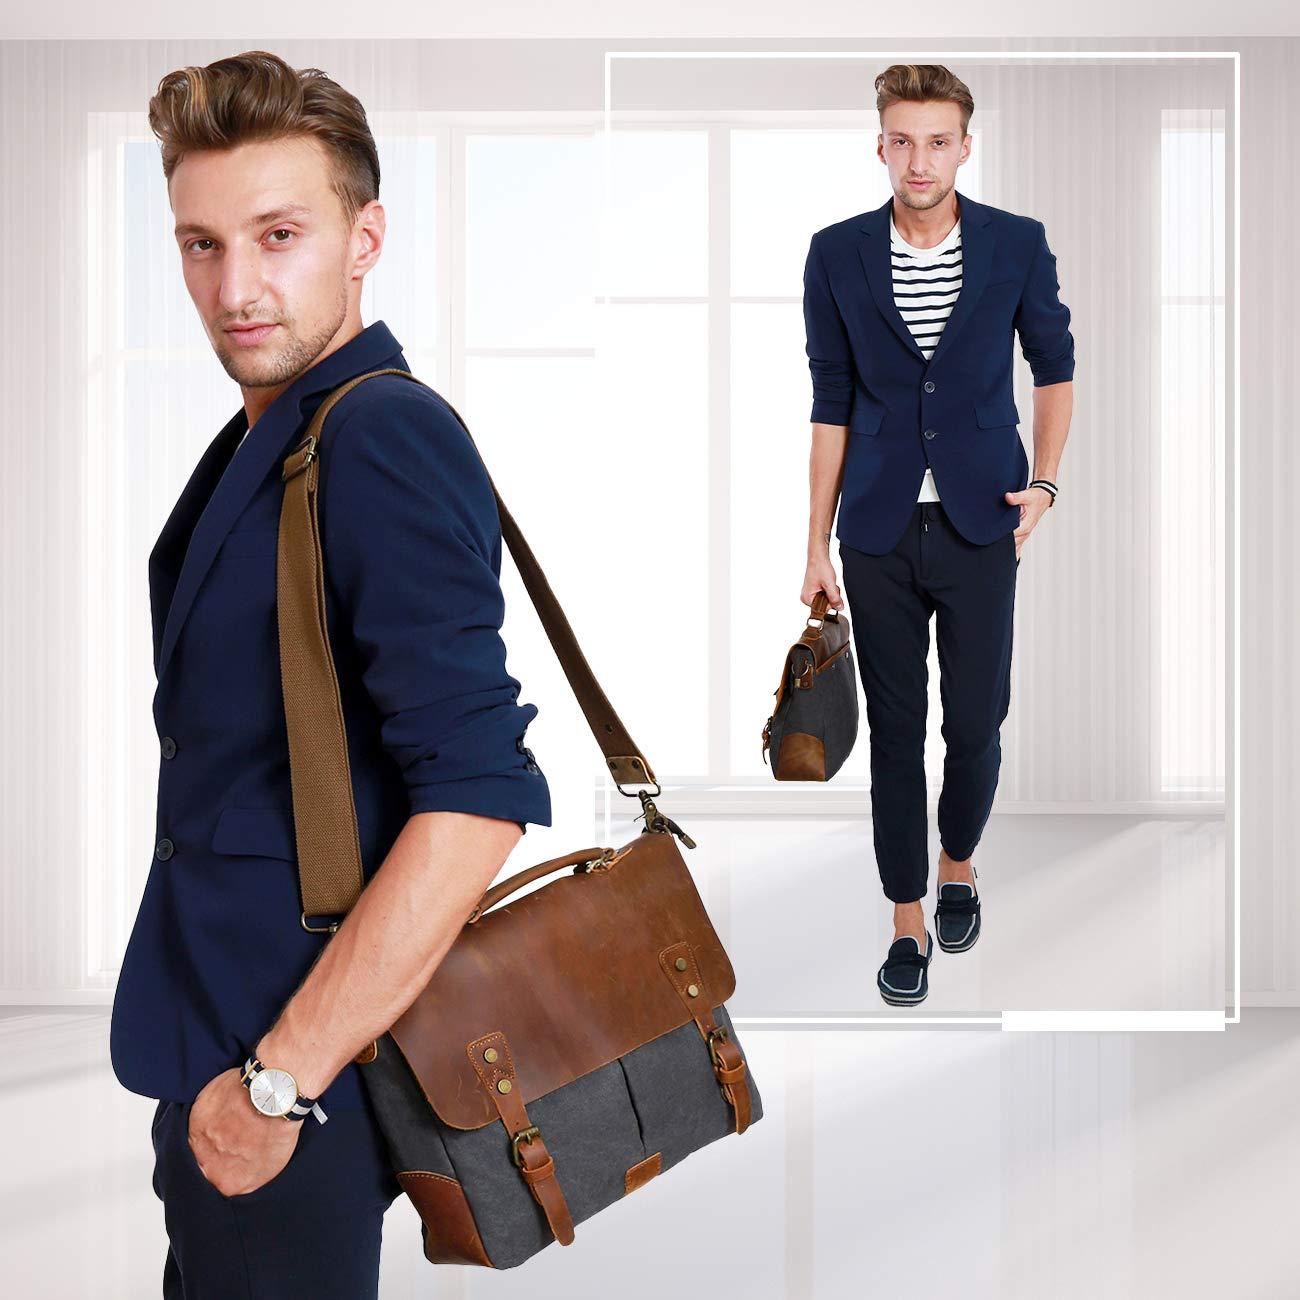 Wowbox Messenger Satchel Bag for Men